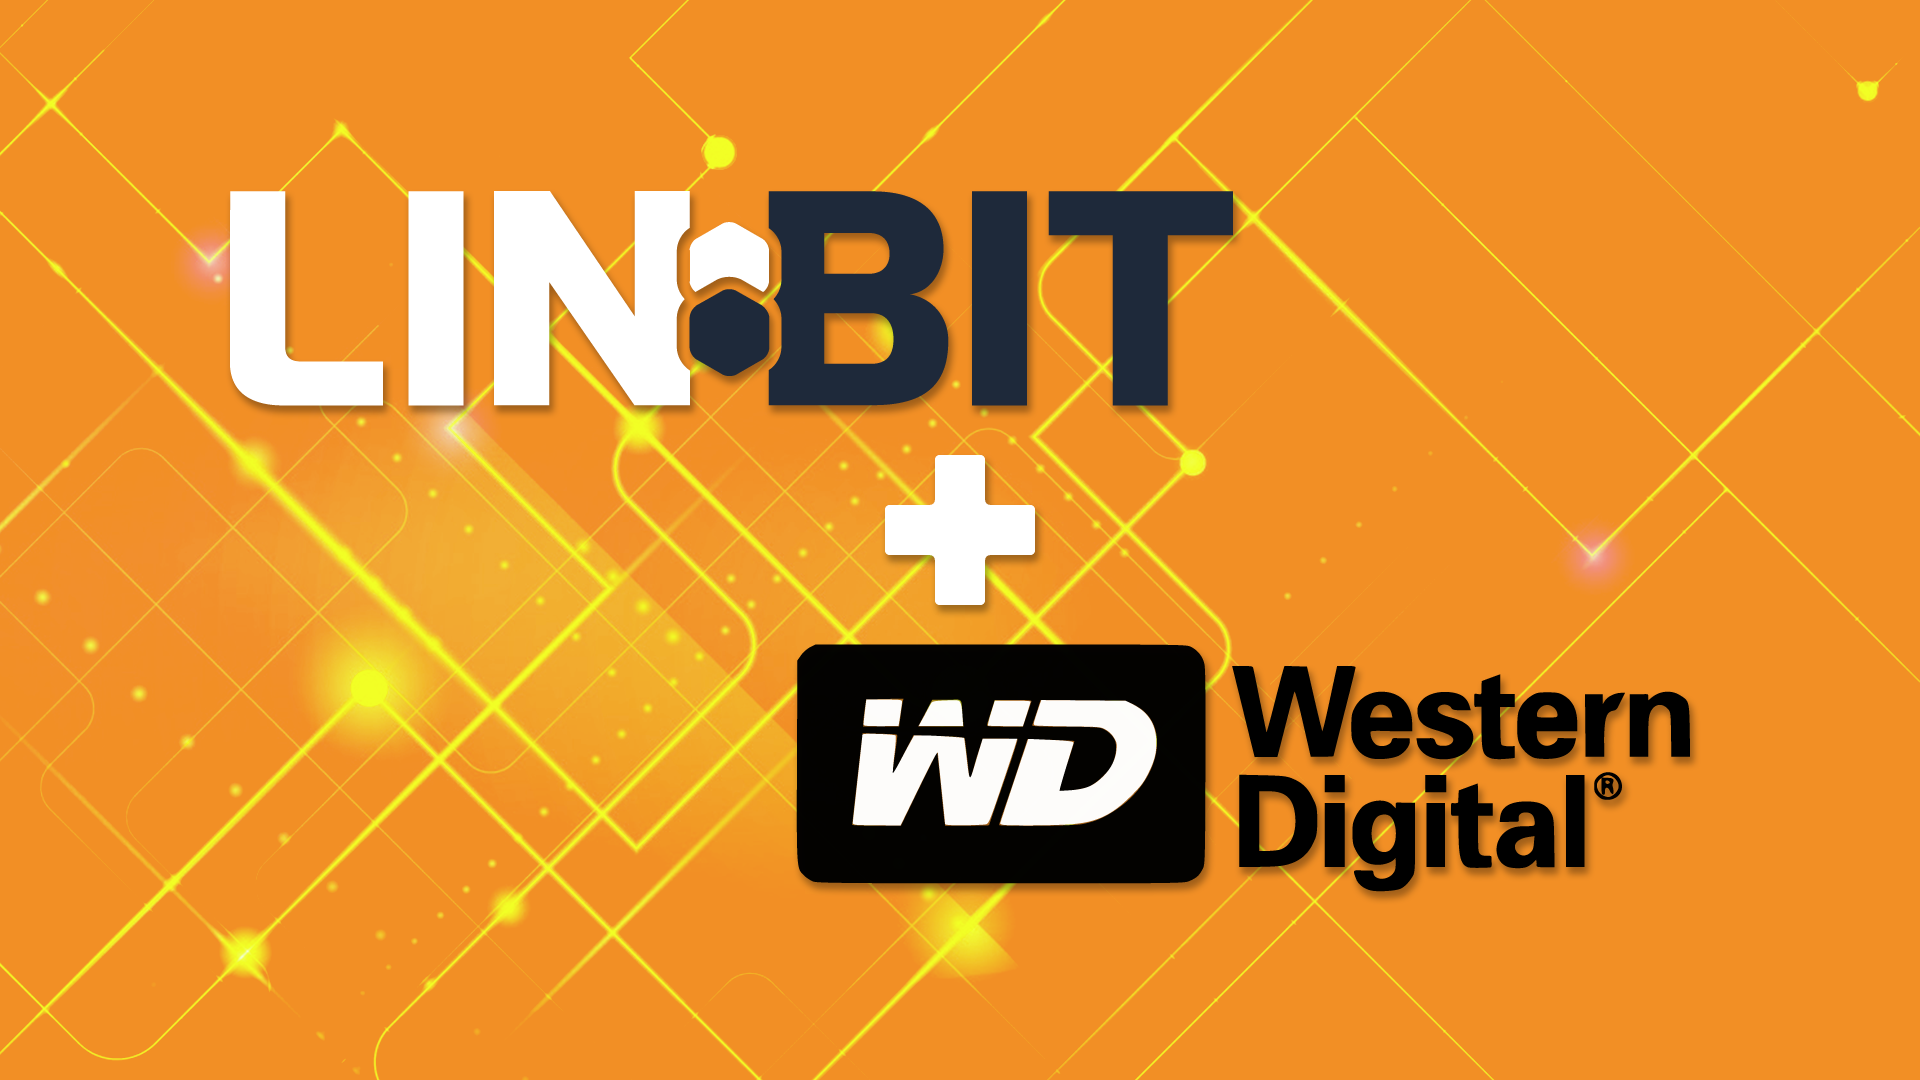 LINBIT has partnered with Western Digital